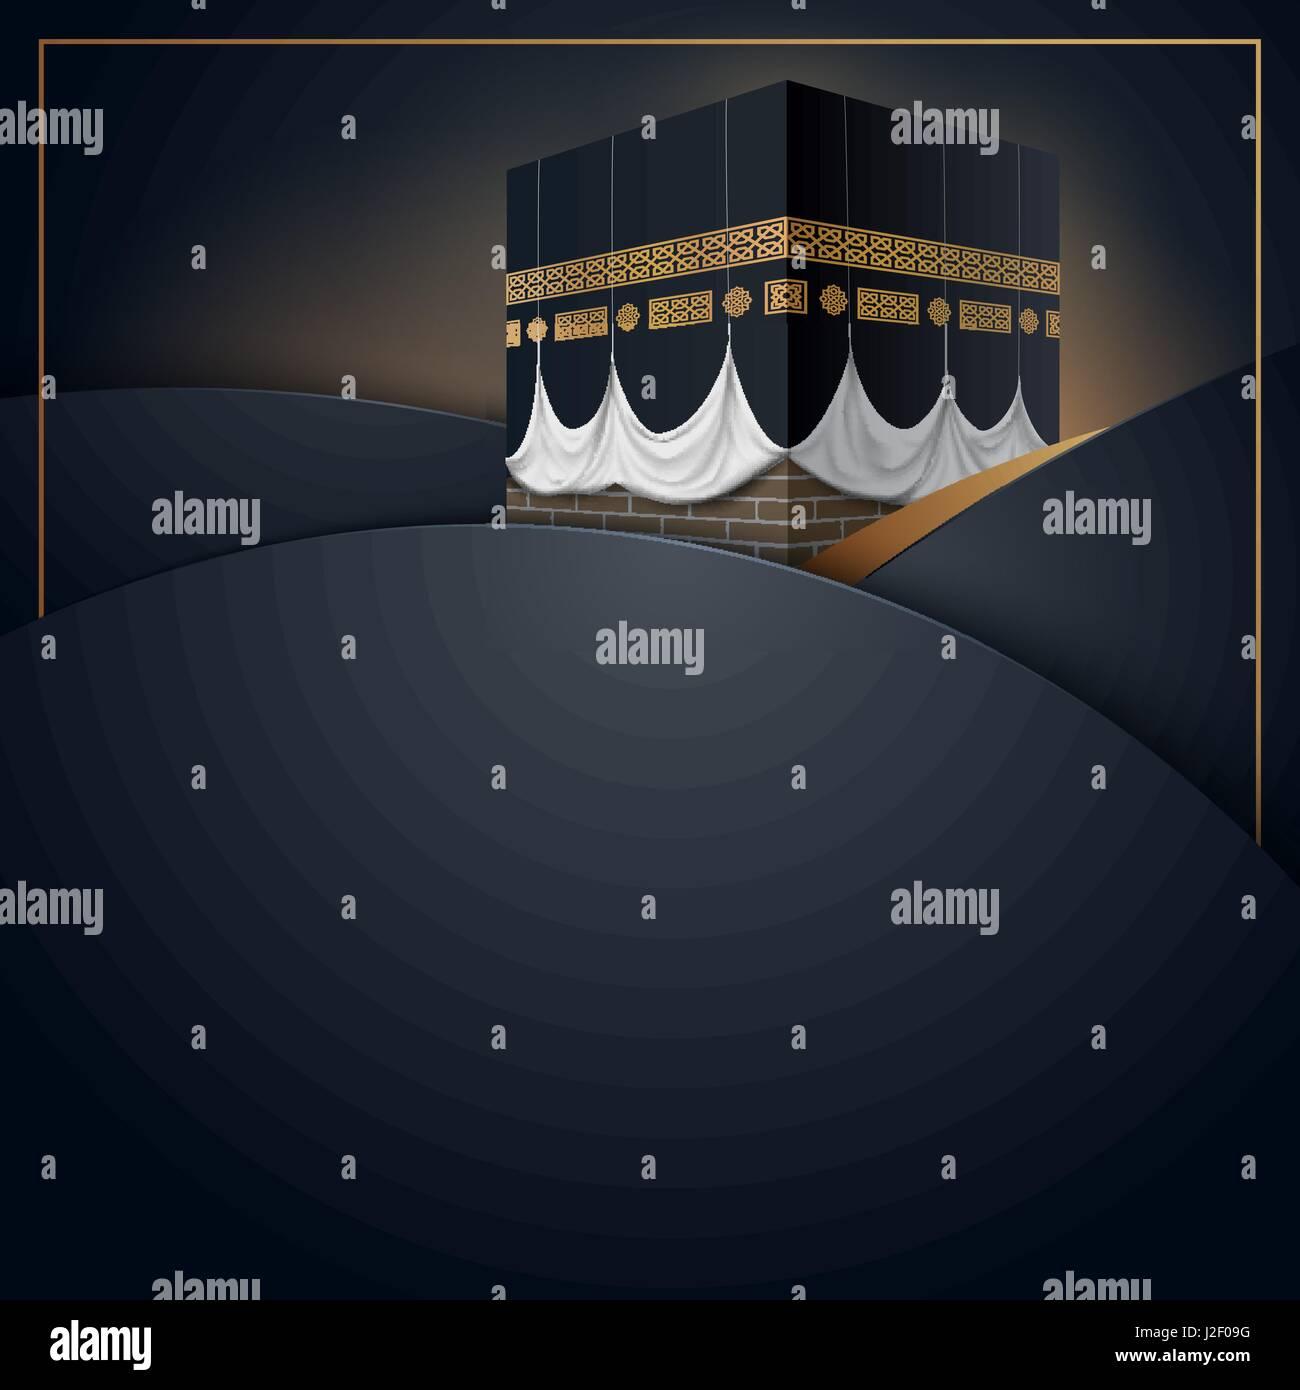 Islamic vector design kaaba icon for hajj and ramadan or eid islamic vector design kaaba icon for hajj and ramadan or eid greeting card template m4hsunfo